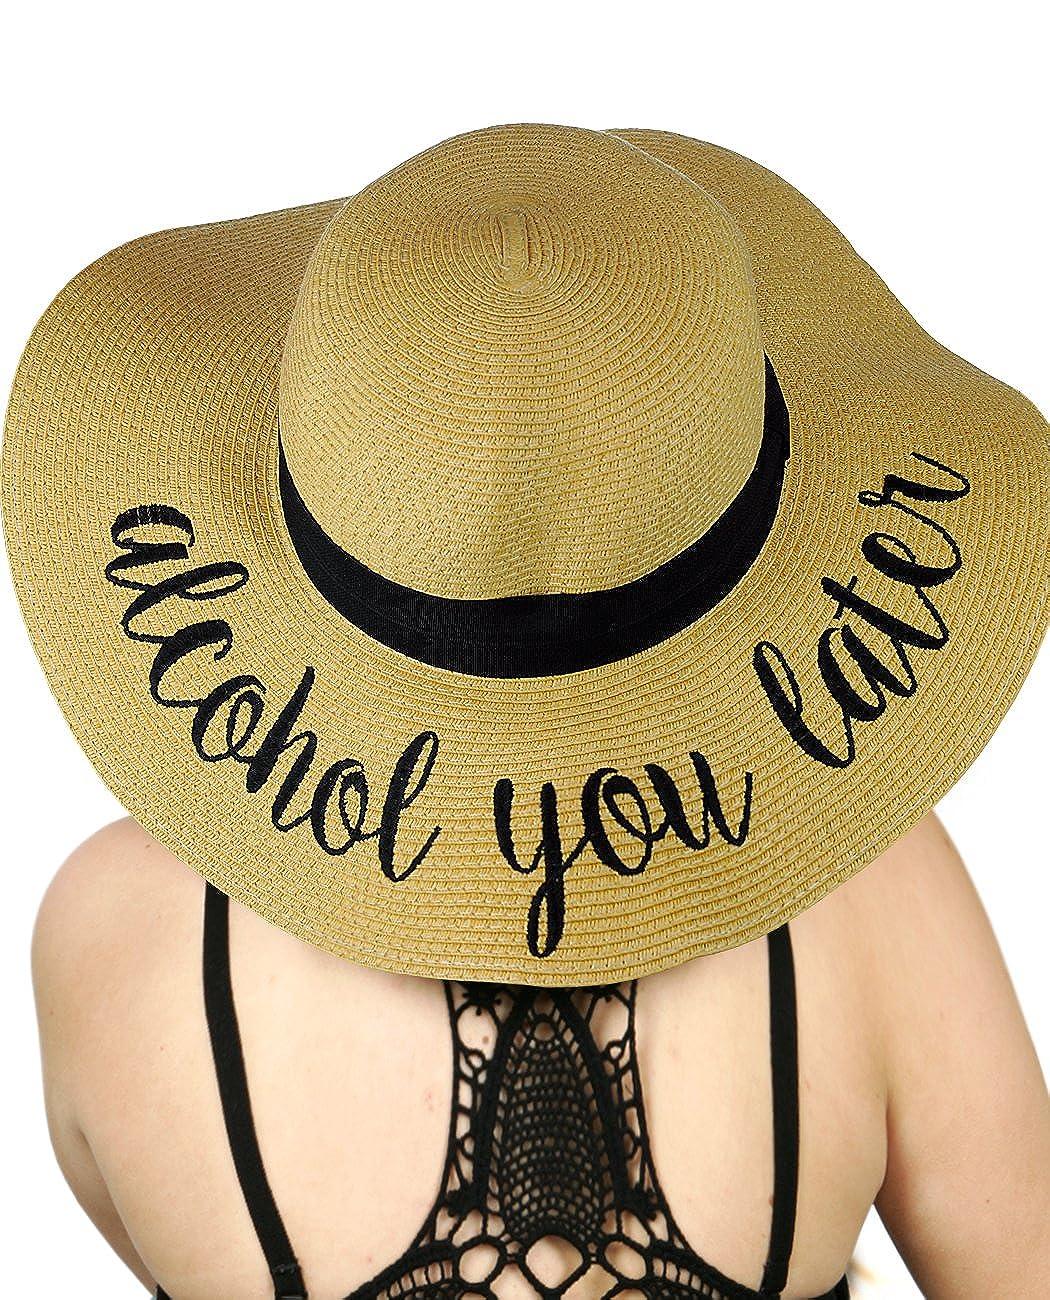 92de9d22d43 C.C Women s Paper Weaved Crushable Beach Embroidered Quote Floppy Brim Sun  Hat